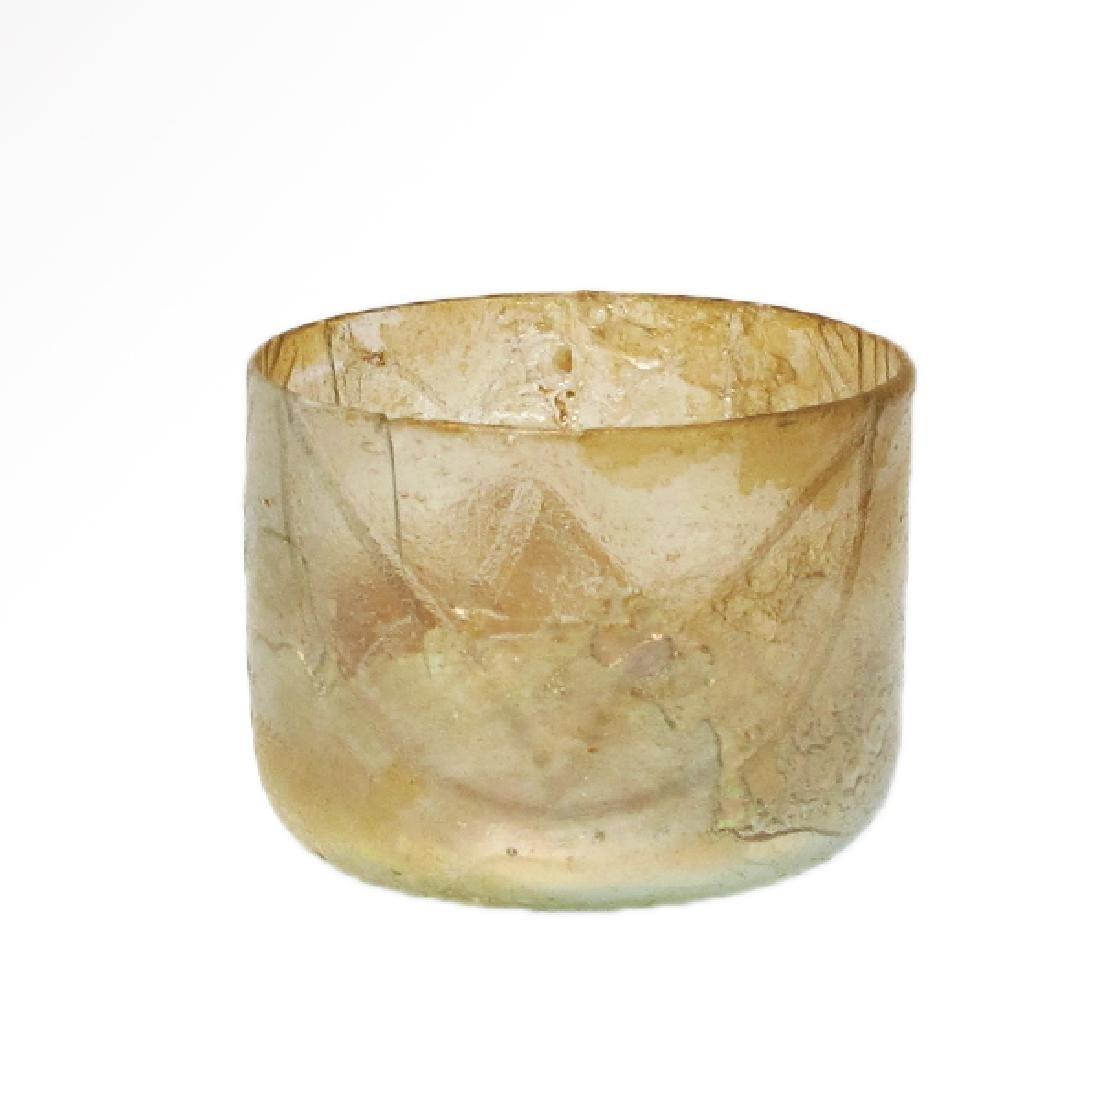 Roman Egyptian Cut Glass Beaker with Lotus